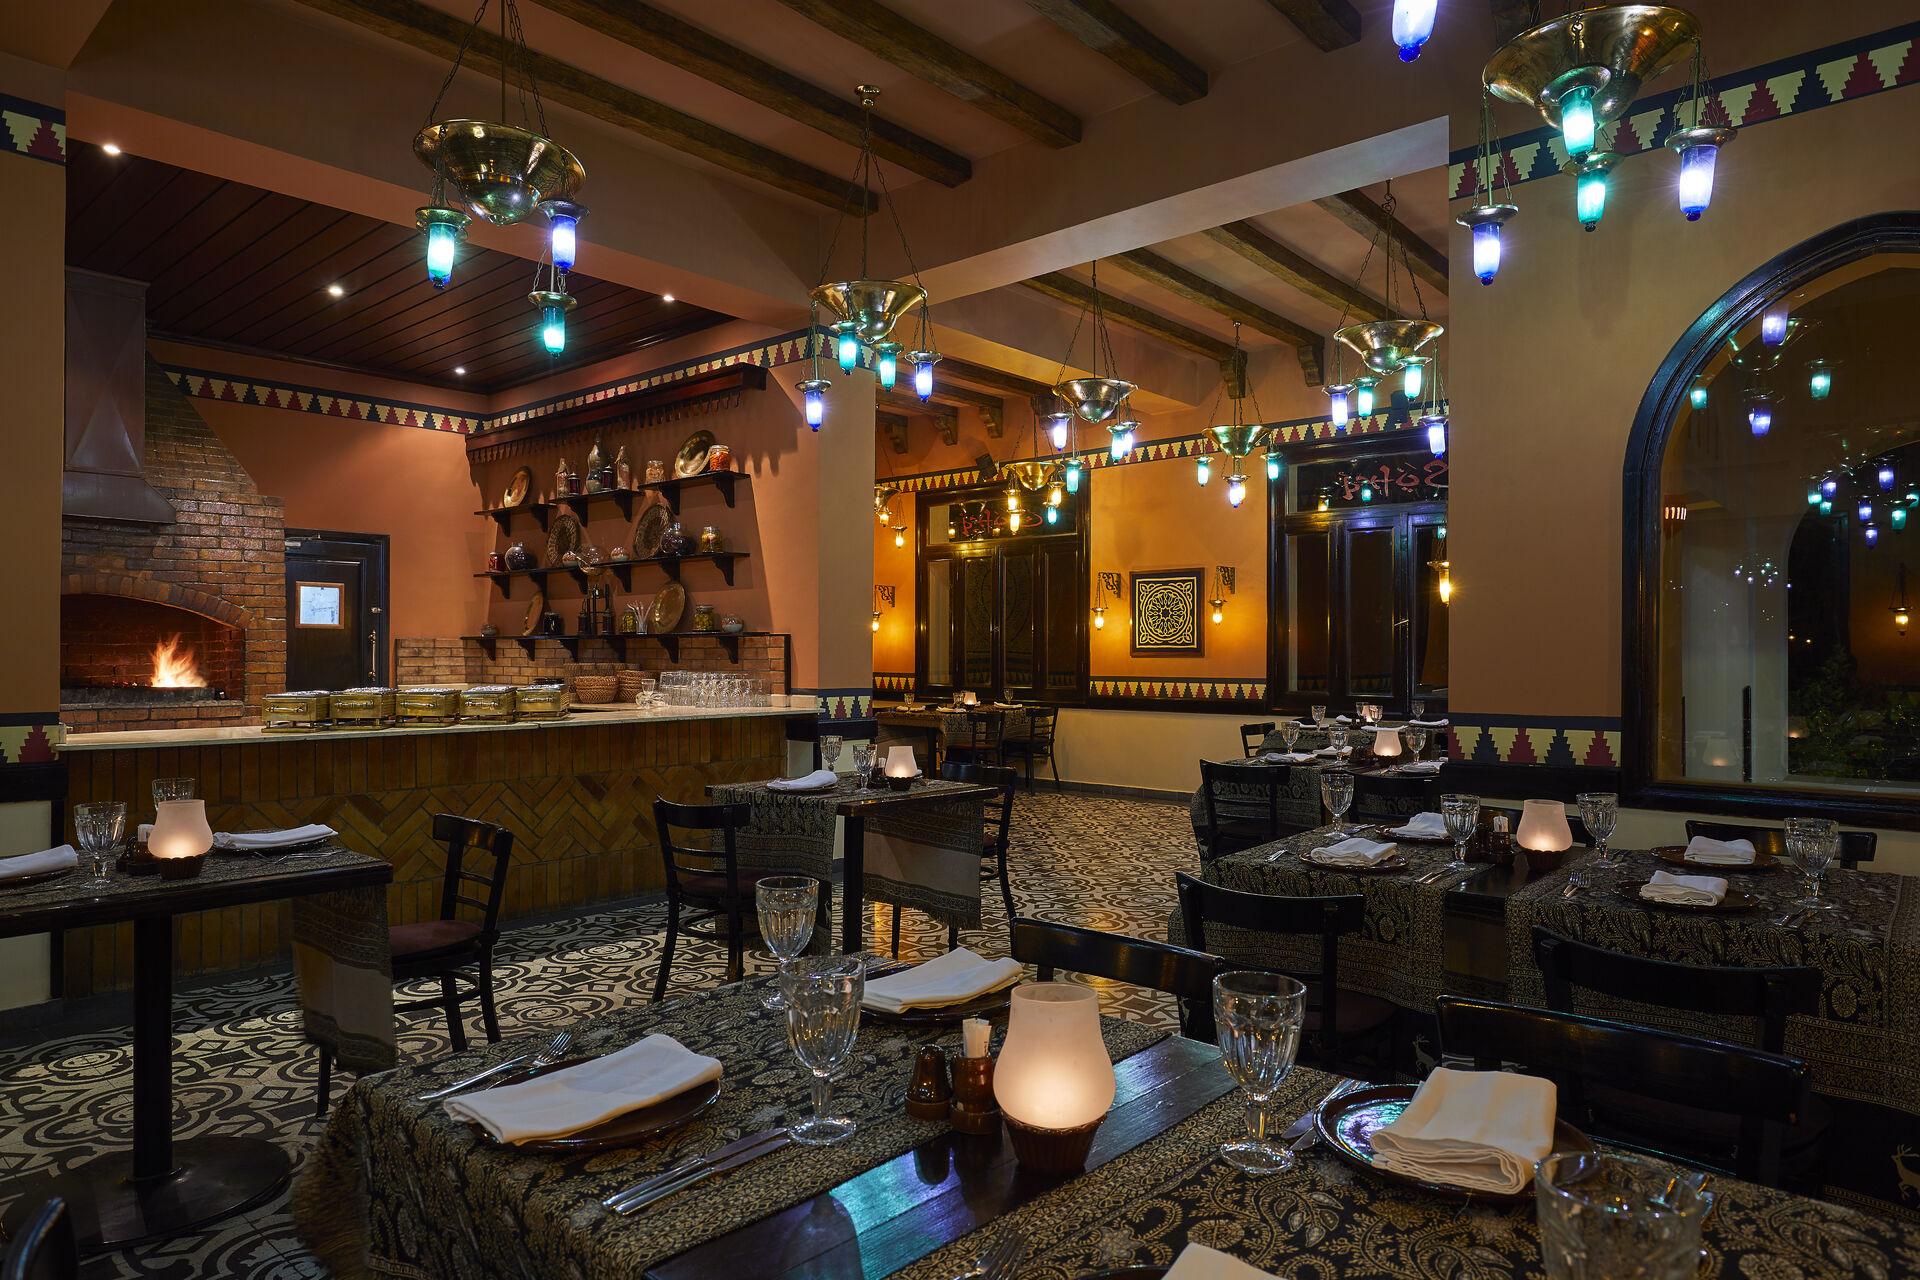 https://cms.satur.sk/data/imgs/tour_image/orig/sofra-oriental-a-la-carte-restaurant-020118-1947561.jpg